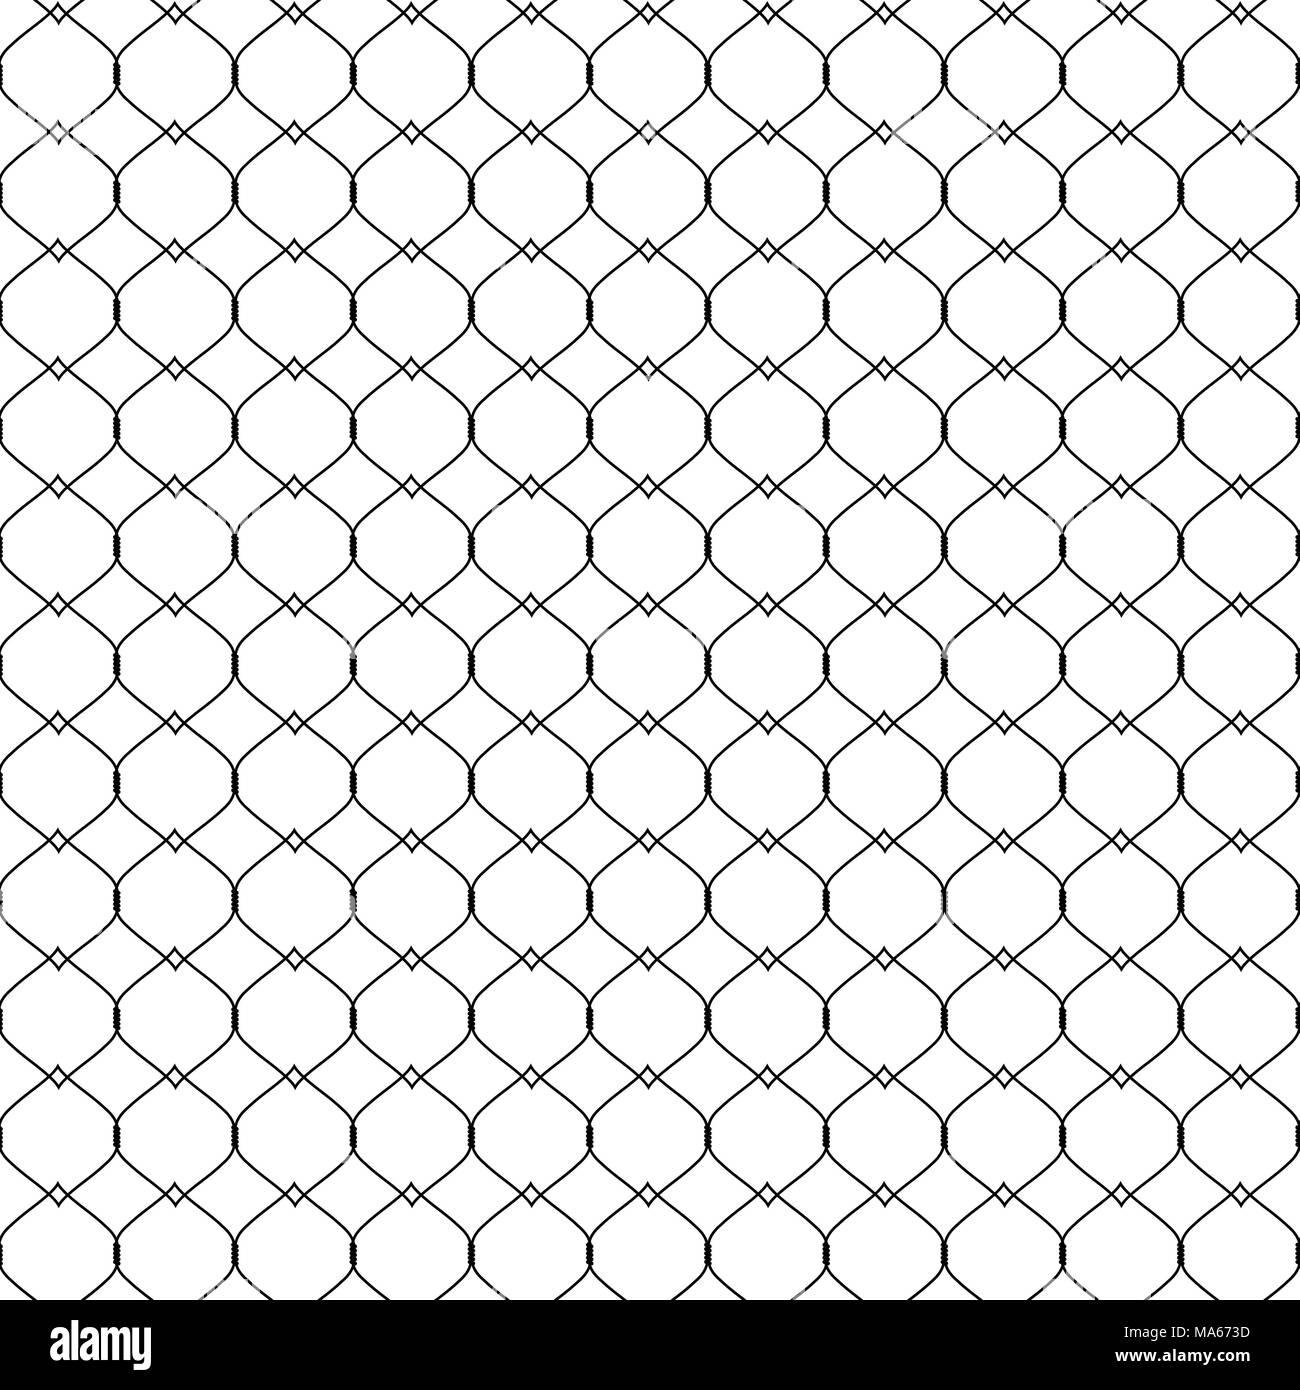 Fishnet Pattern Simple Inspiration Design